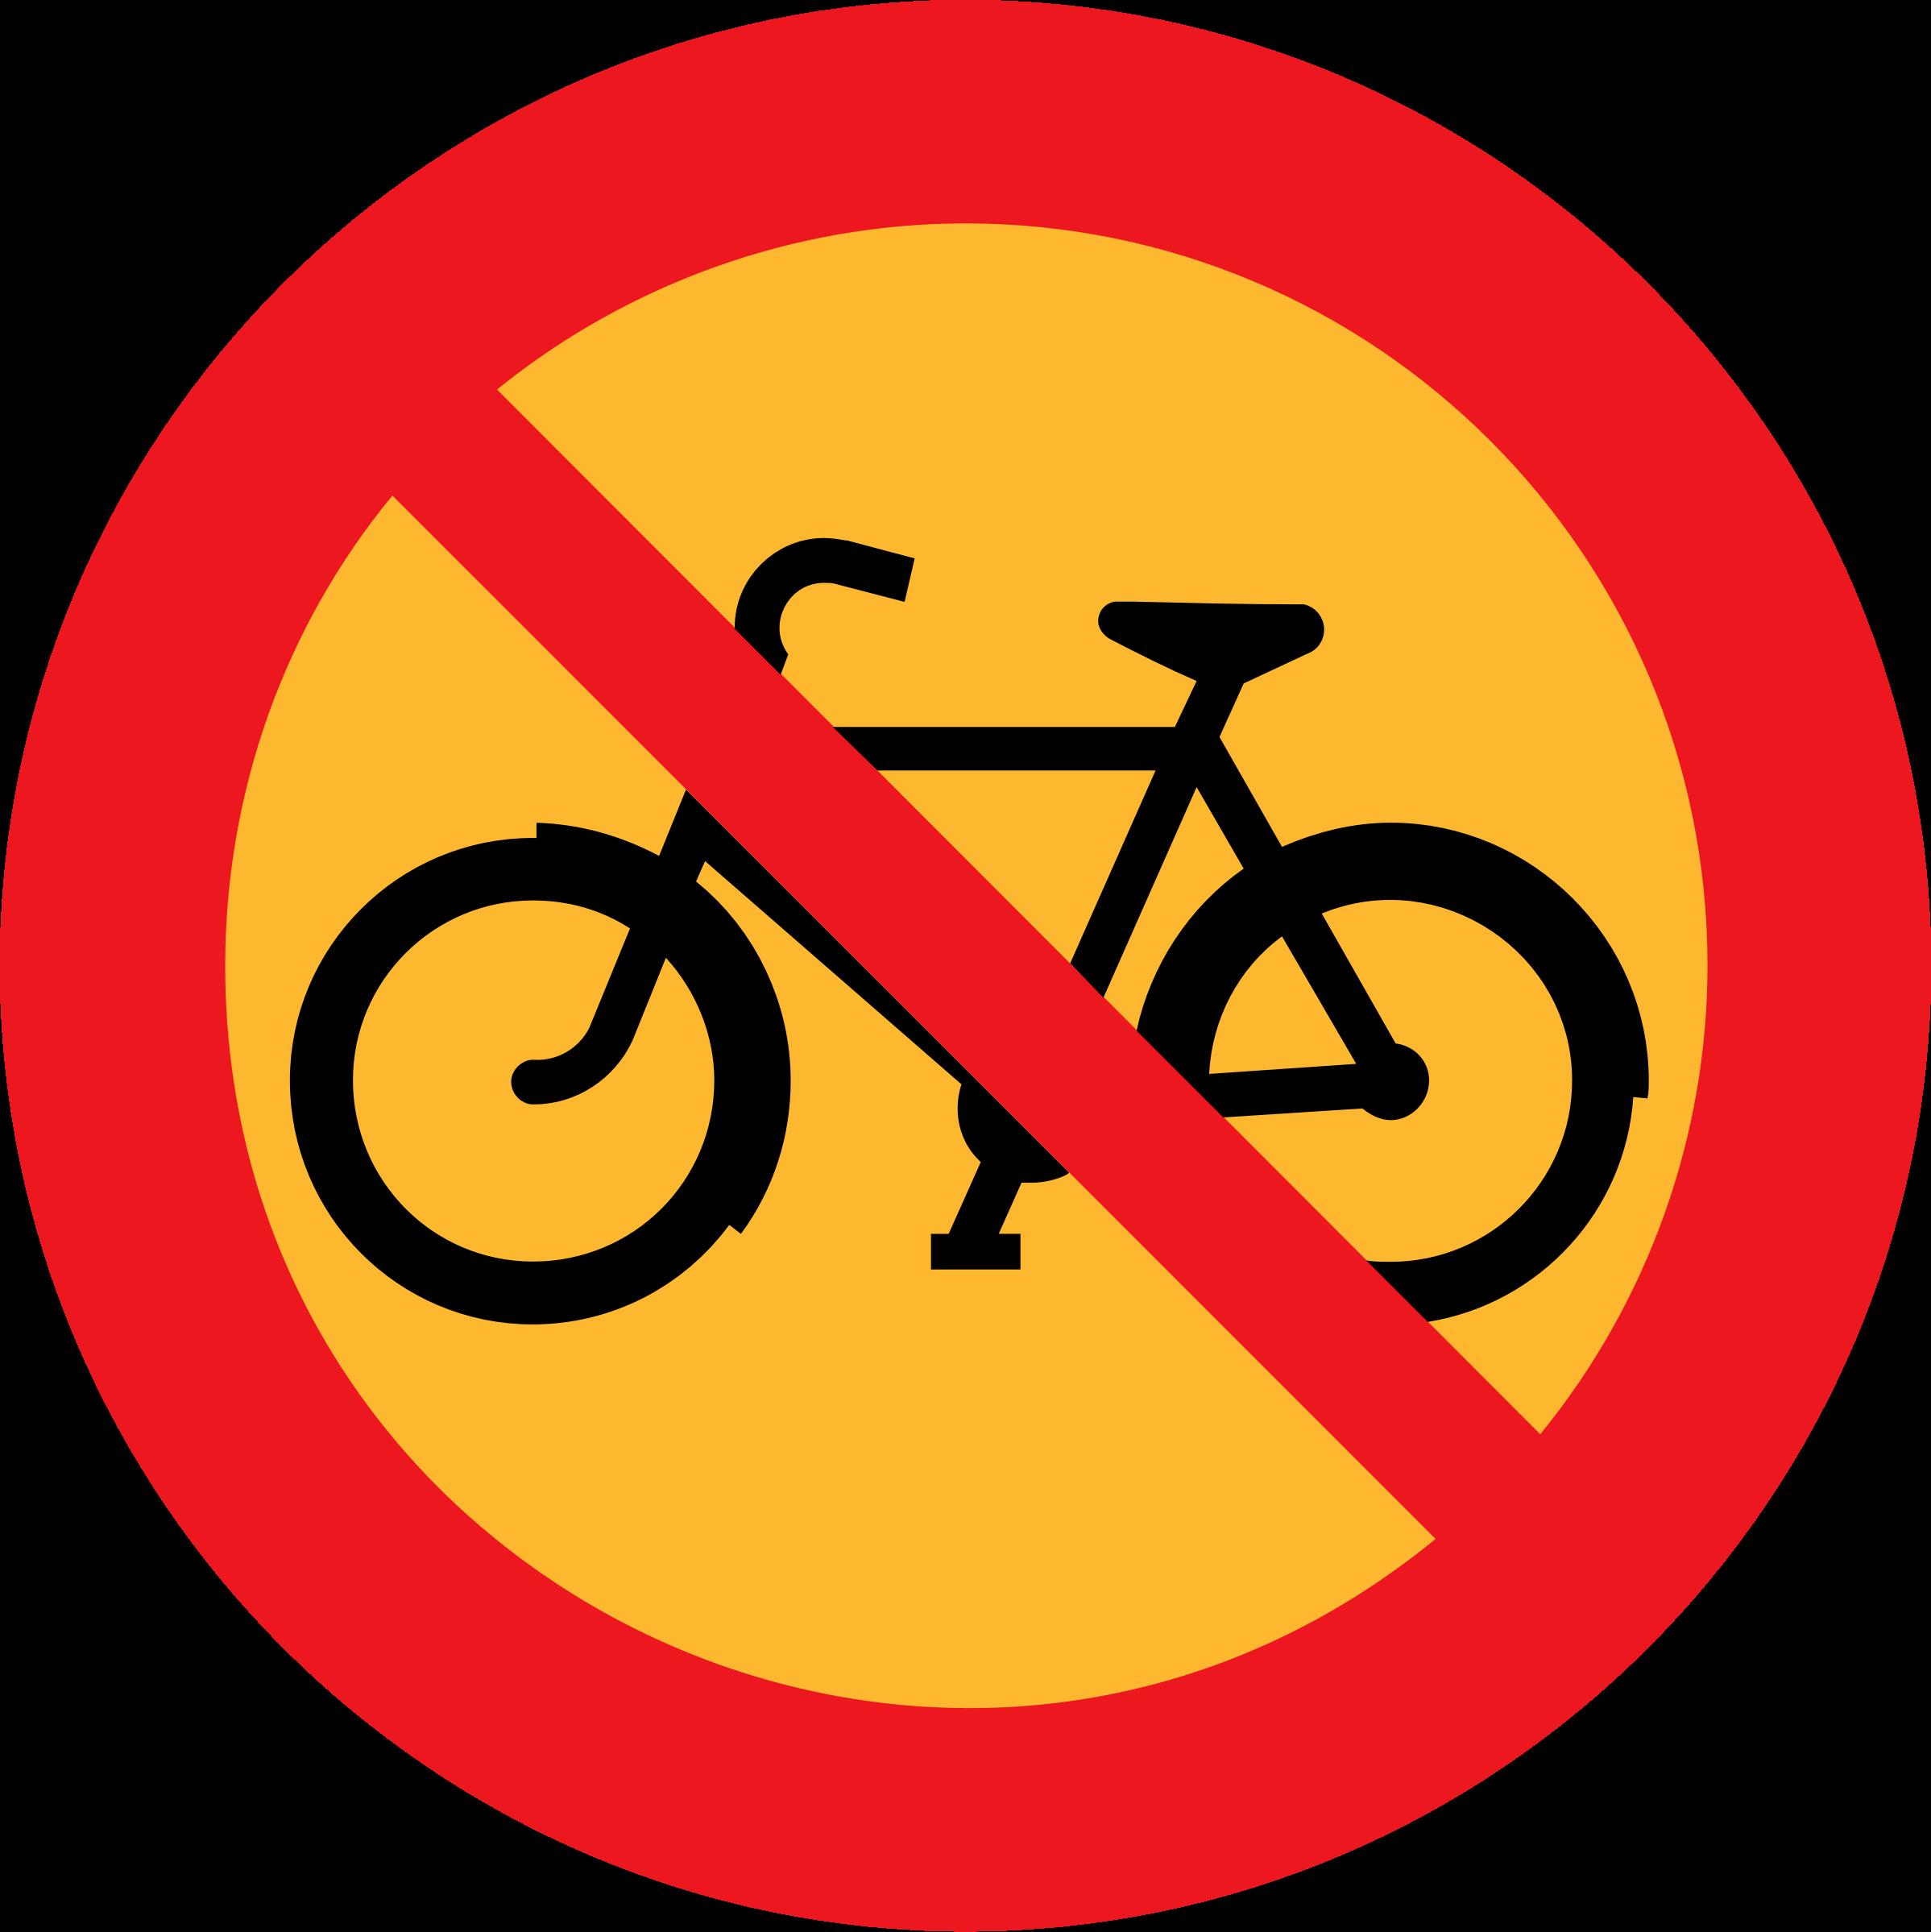 No bicycles roadsign big. Clipart bicycle orange